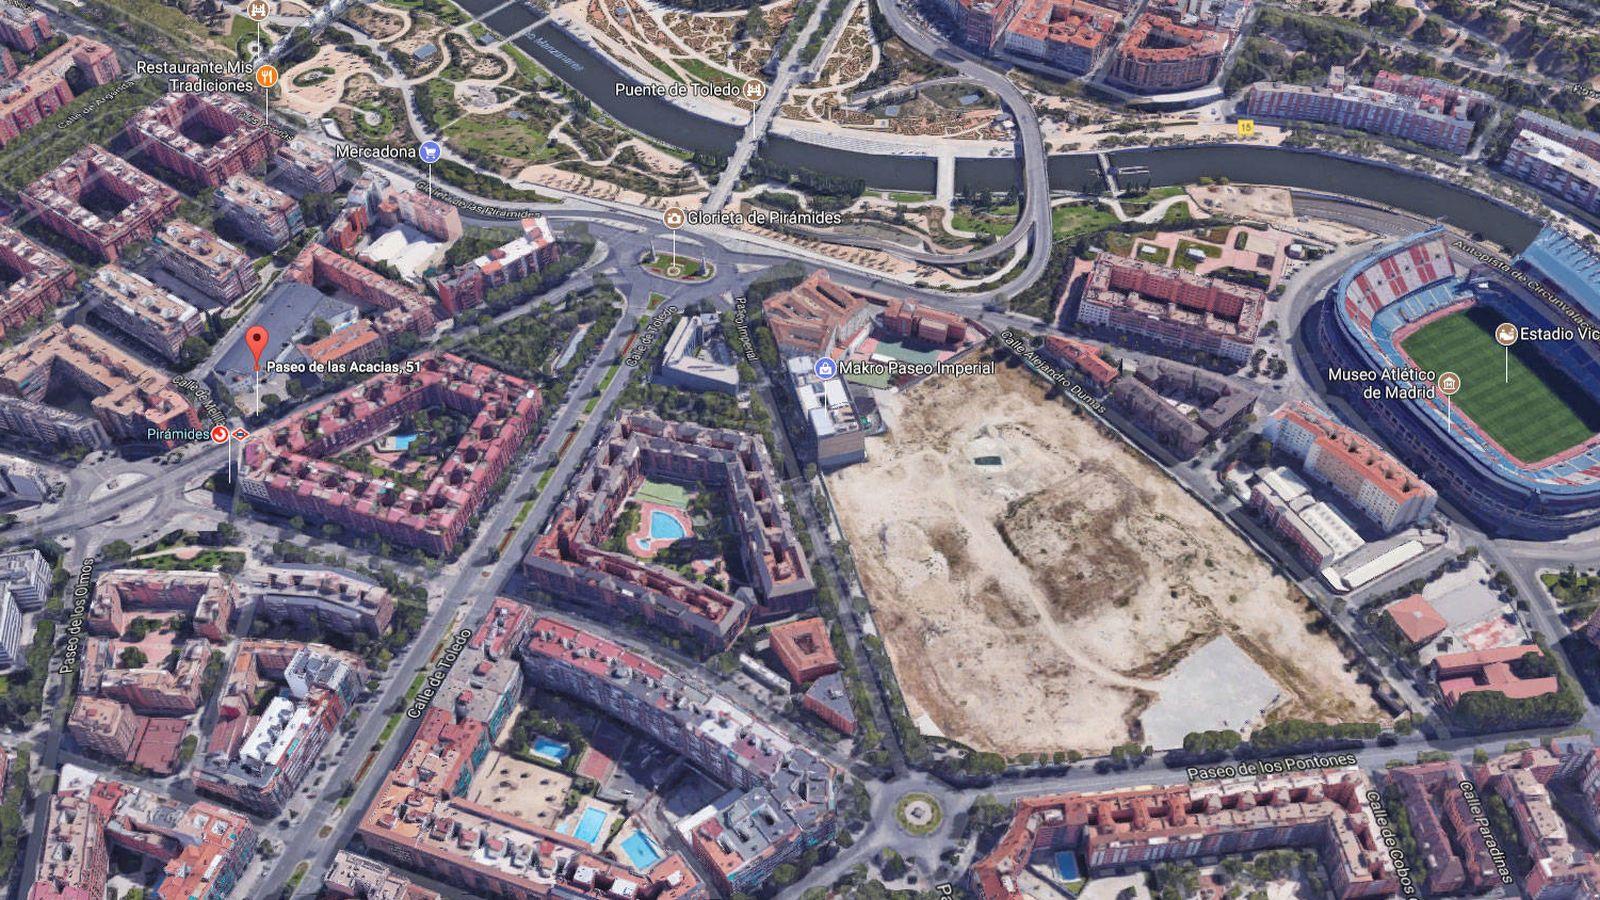 Foto: Imagen aérea de la zona.